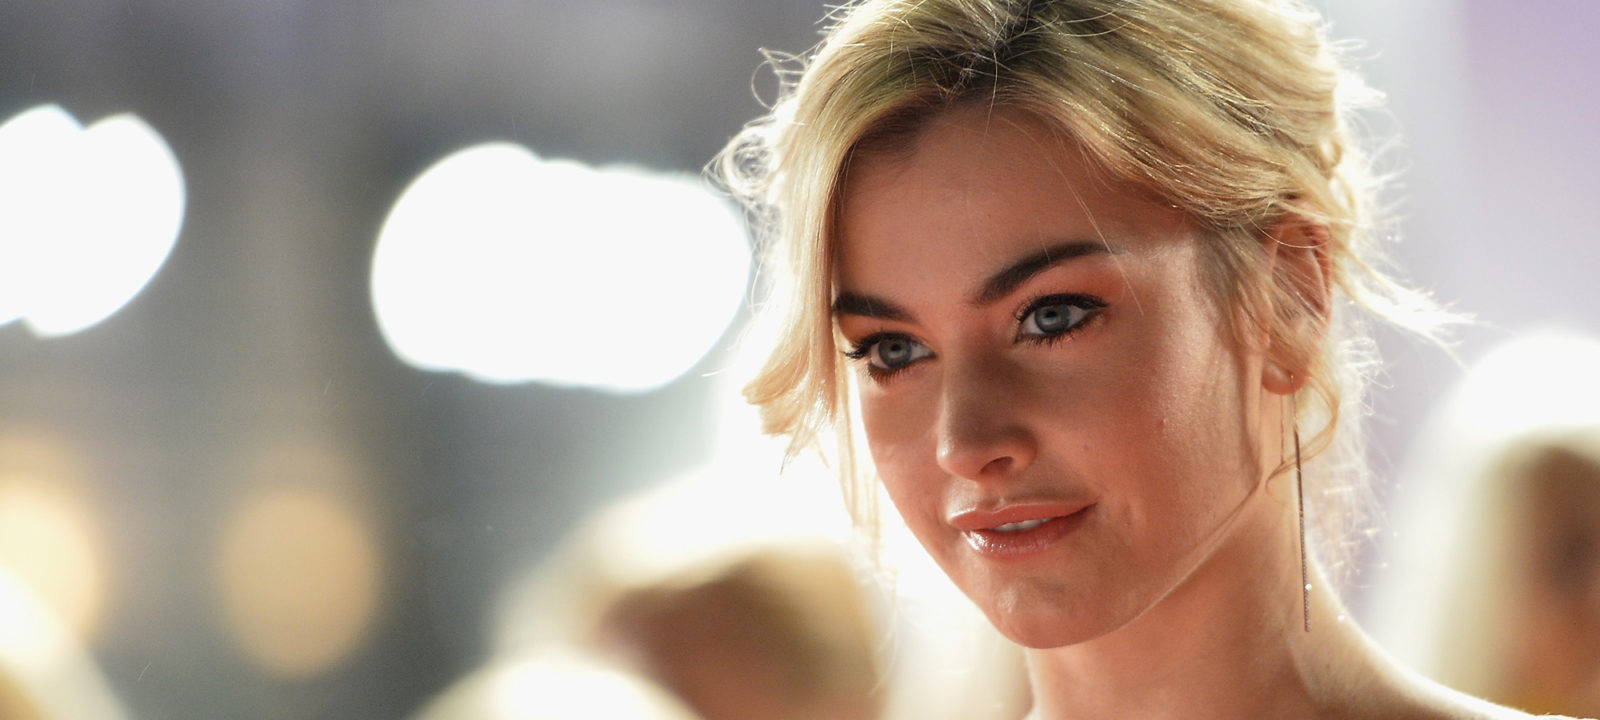 National Television Awards – Red Carpet Arrivals